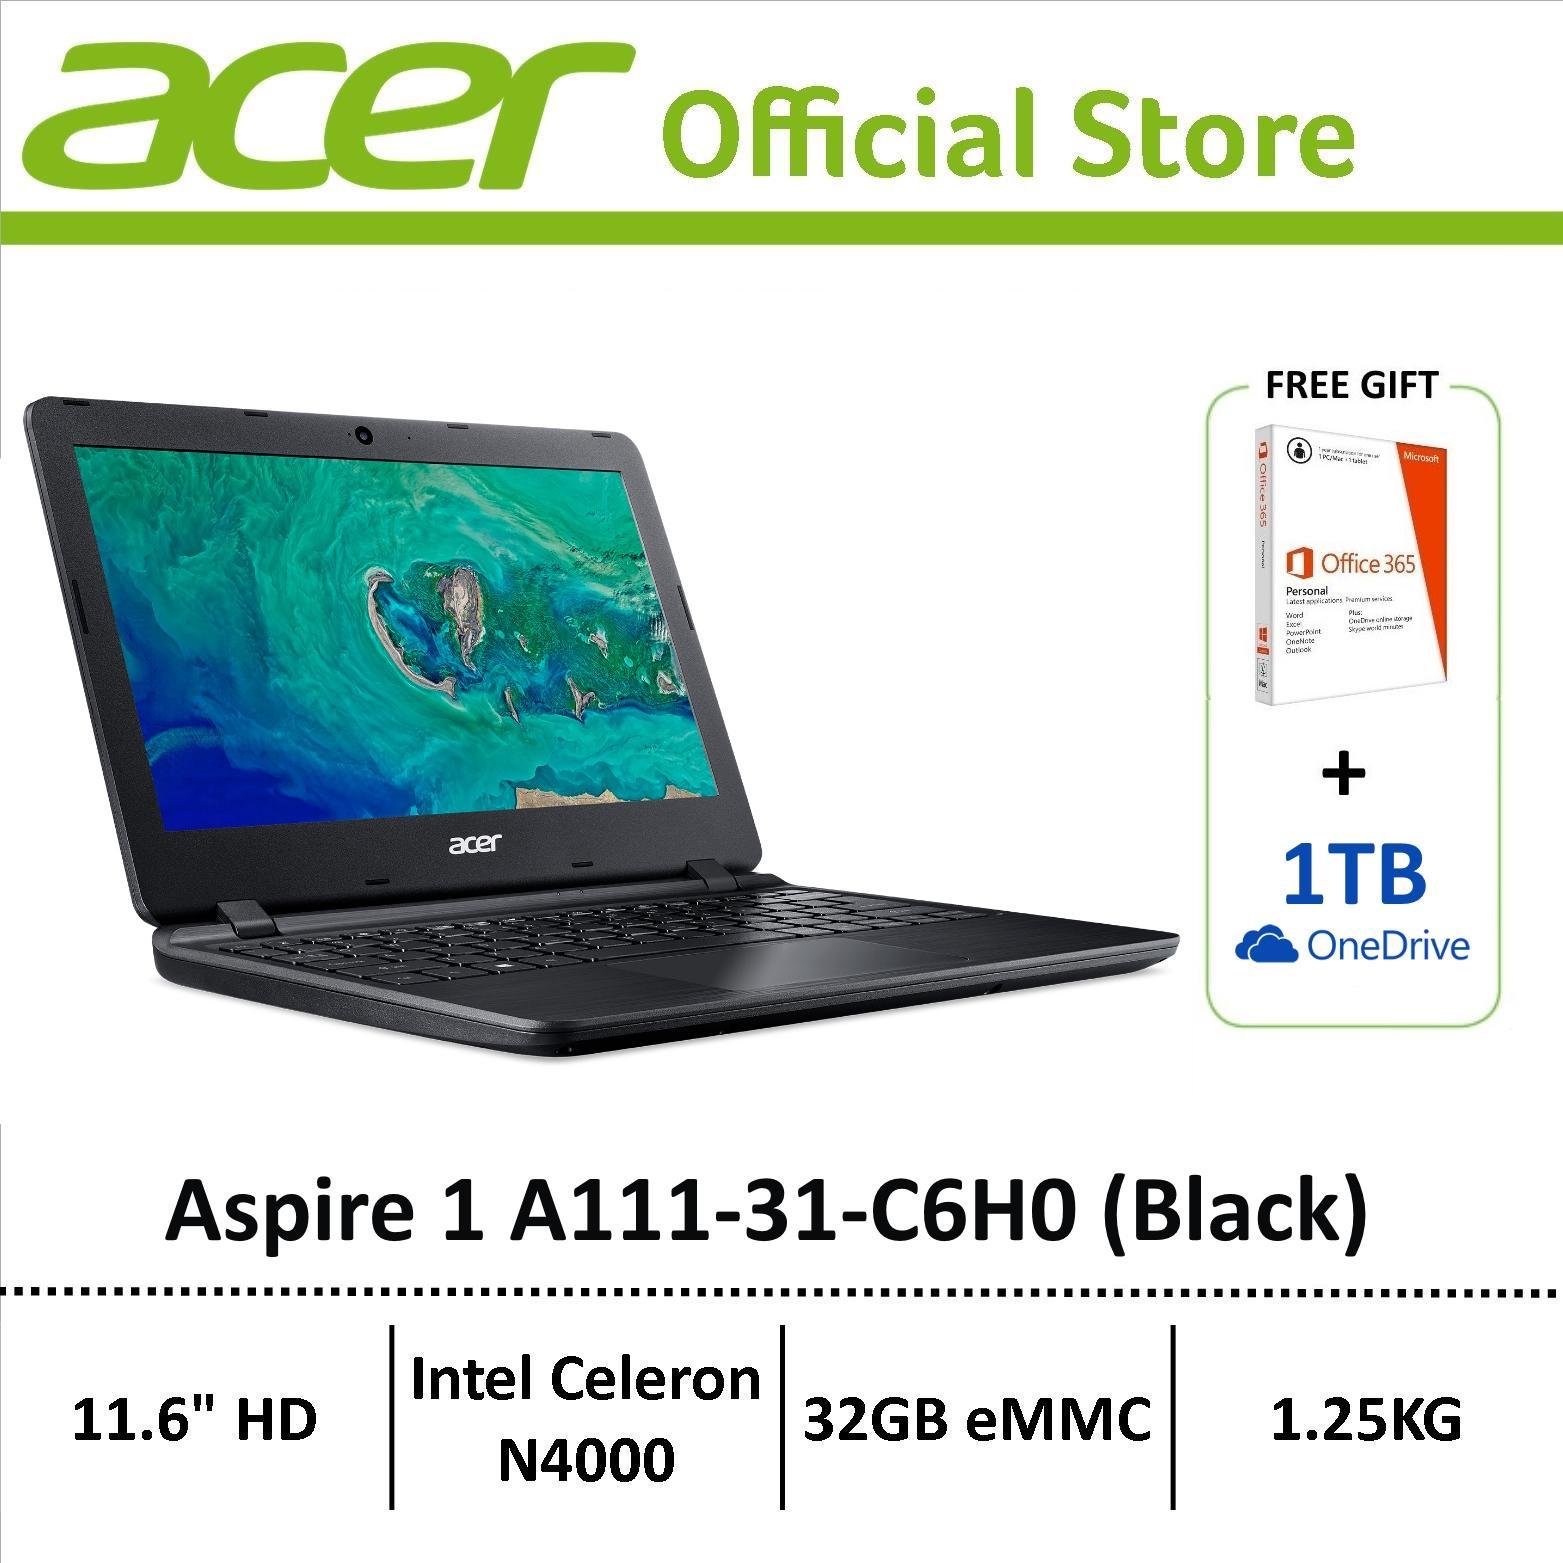 Acer Aspire 1 A111-31-C6H0 (Black) 11.6-inch HD Lightweight Laptop